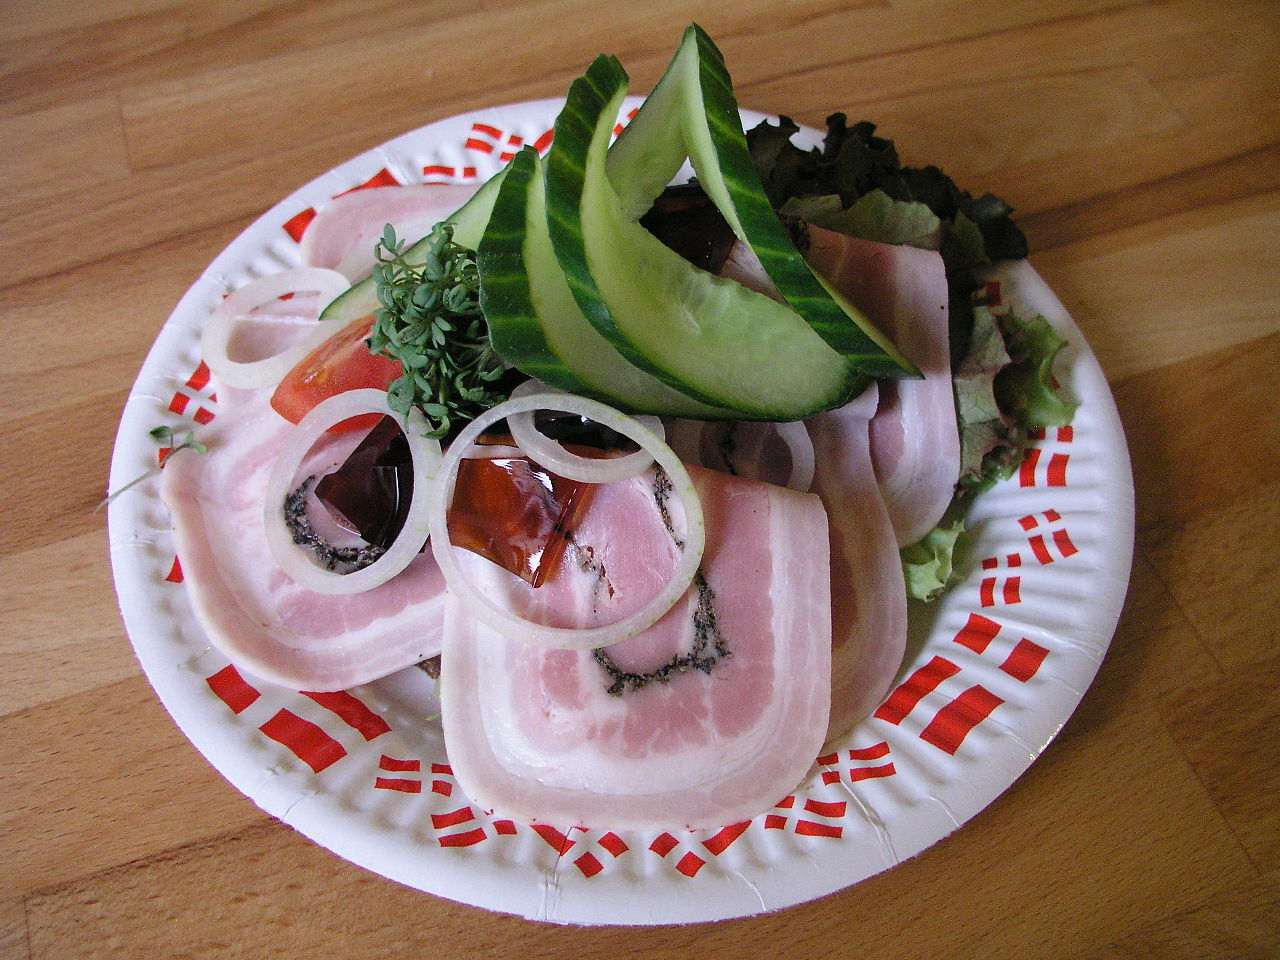 Rullepolse served as part of an open-faced sandwich